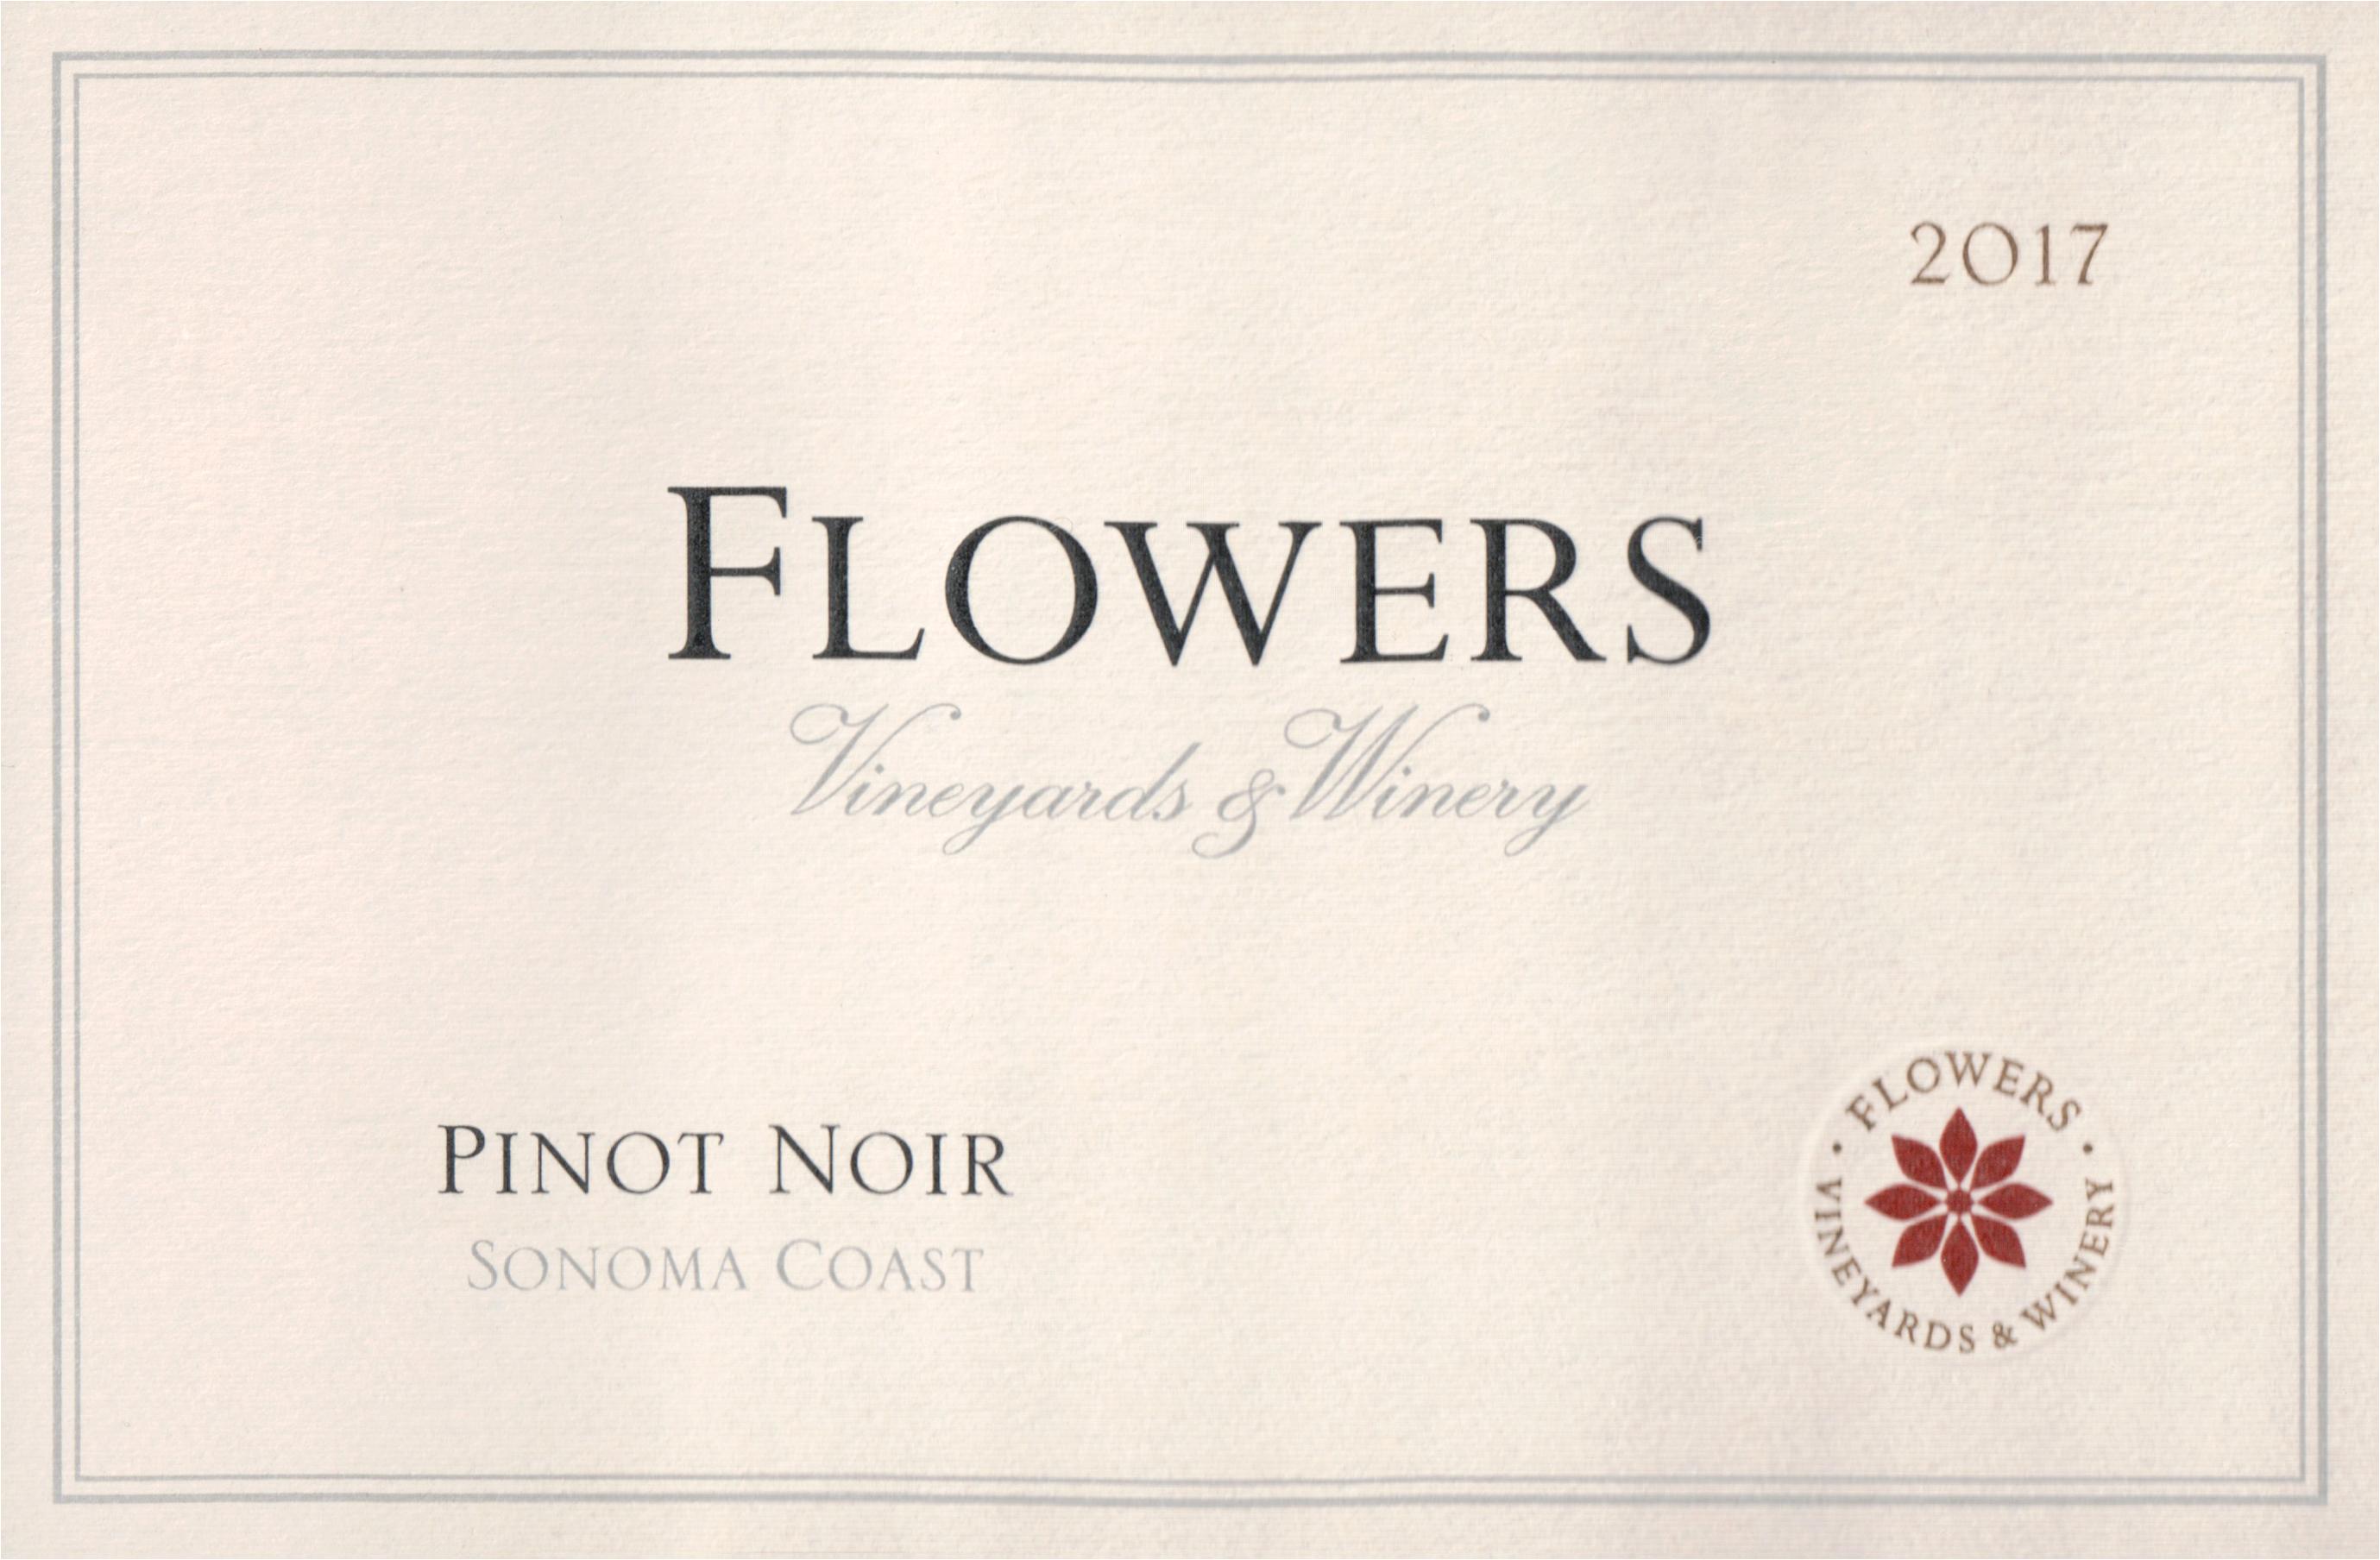 Flowers Sonoma Coast Pinot Noir 2017